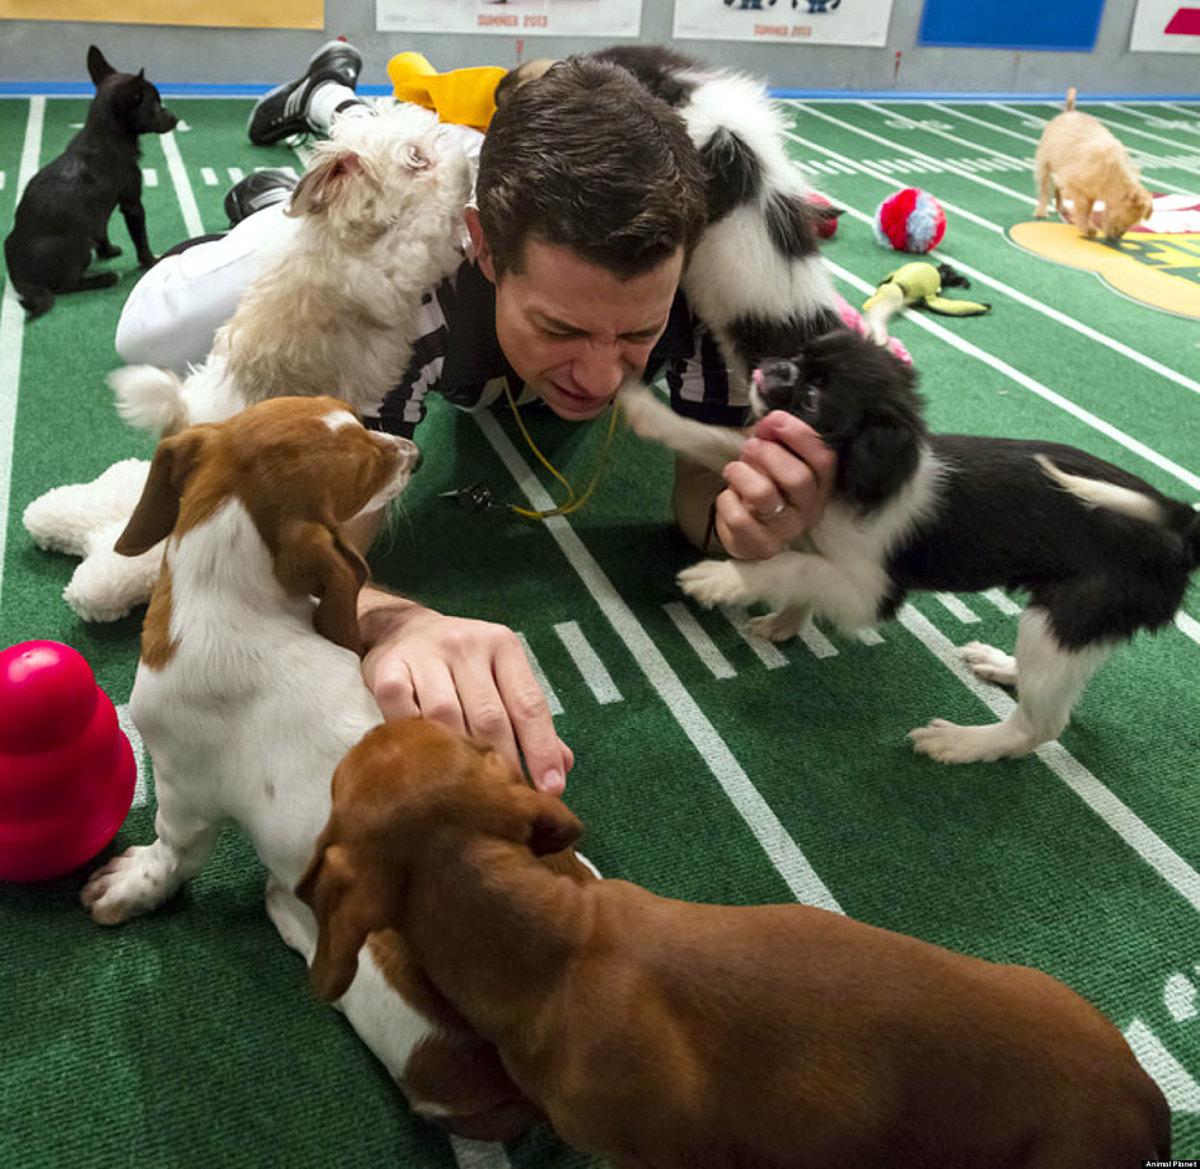 Puppy-Bowl-IX-referee.jpg